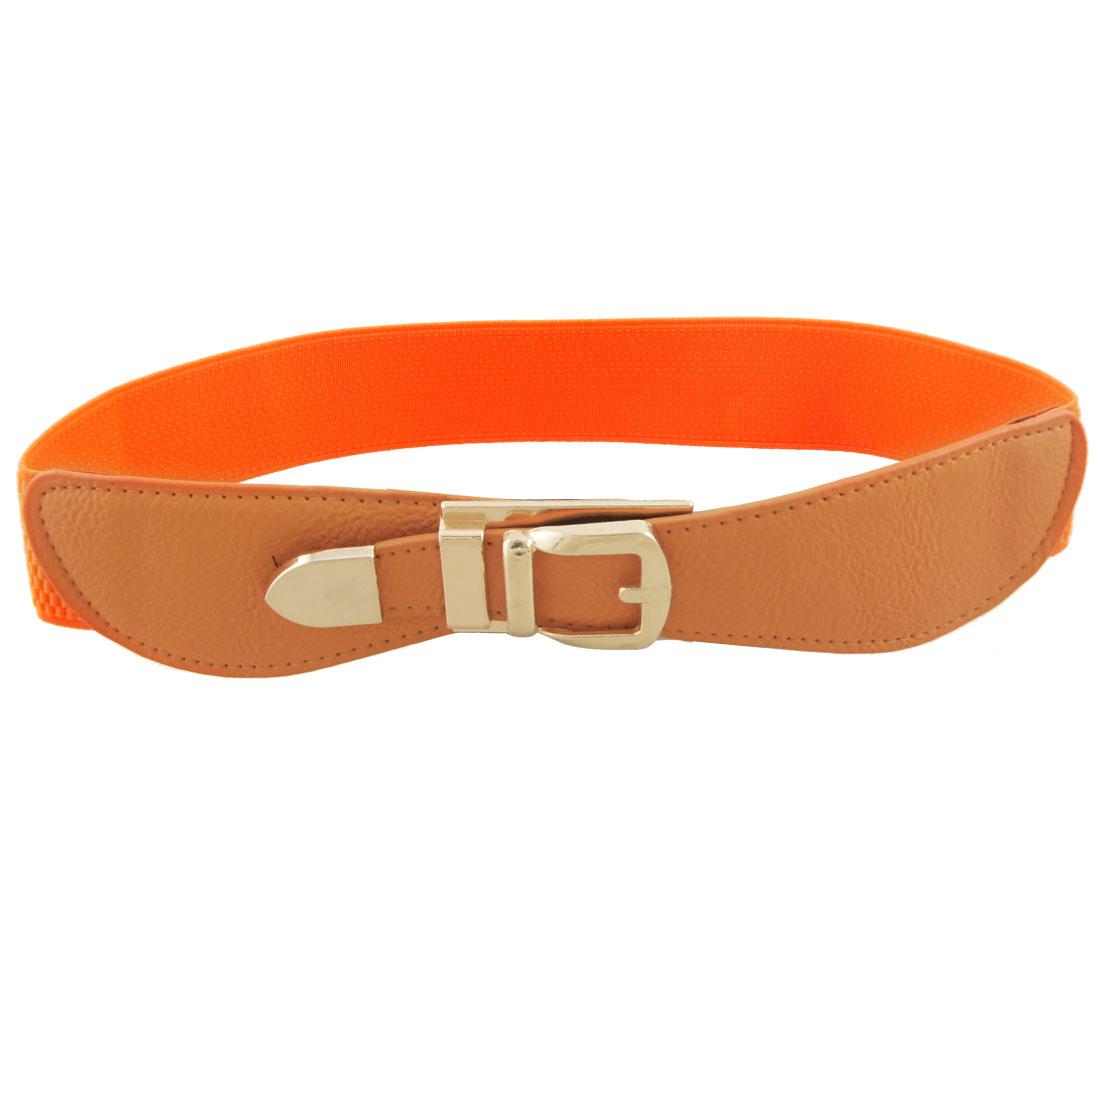 "Lady Brown Faux Leather Orange Elastic 1.5"" Wide Cinch Belt"